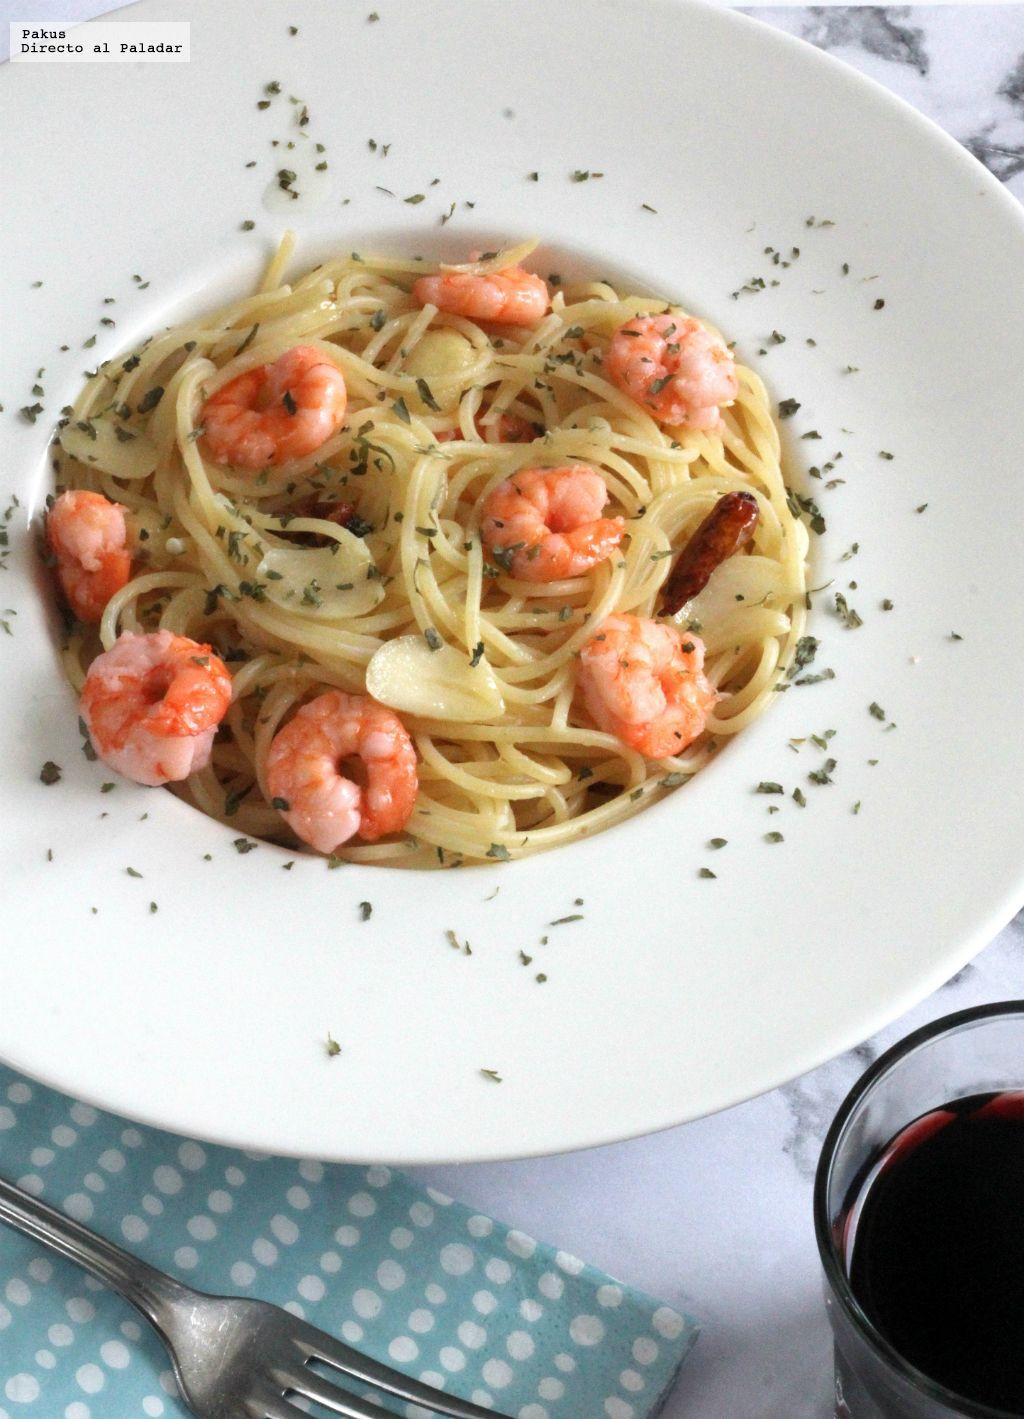 Espaguetinis Con Gambas Al Ajillo Receta Exprés De Pasta Con Tres Ingredientes